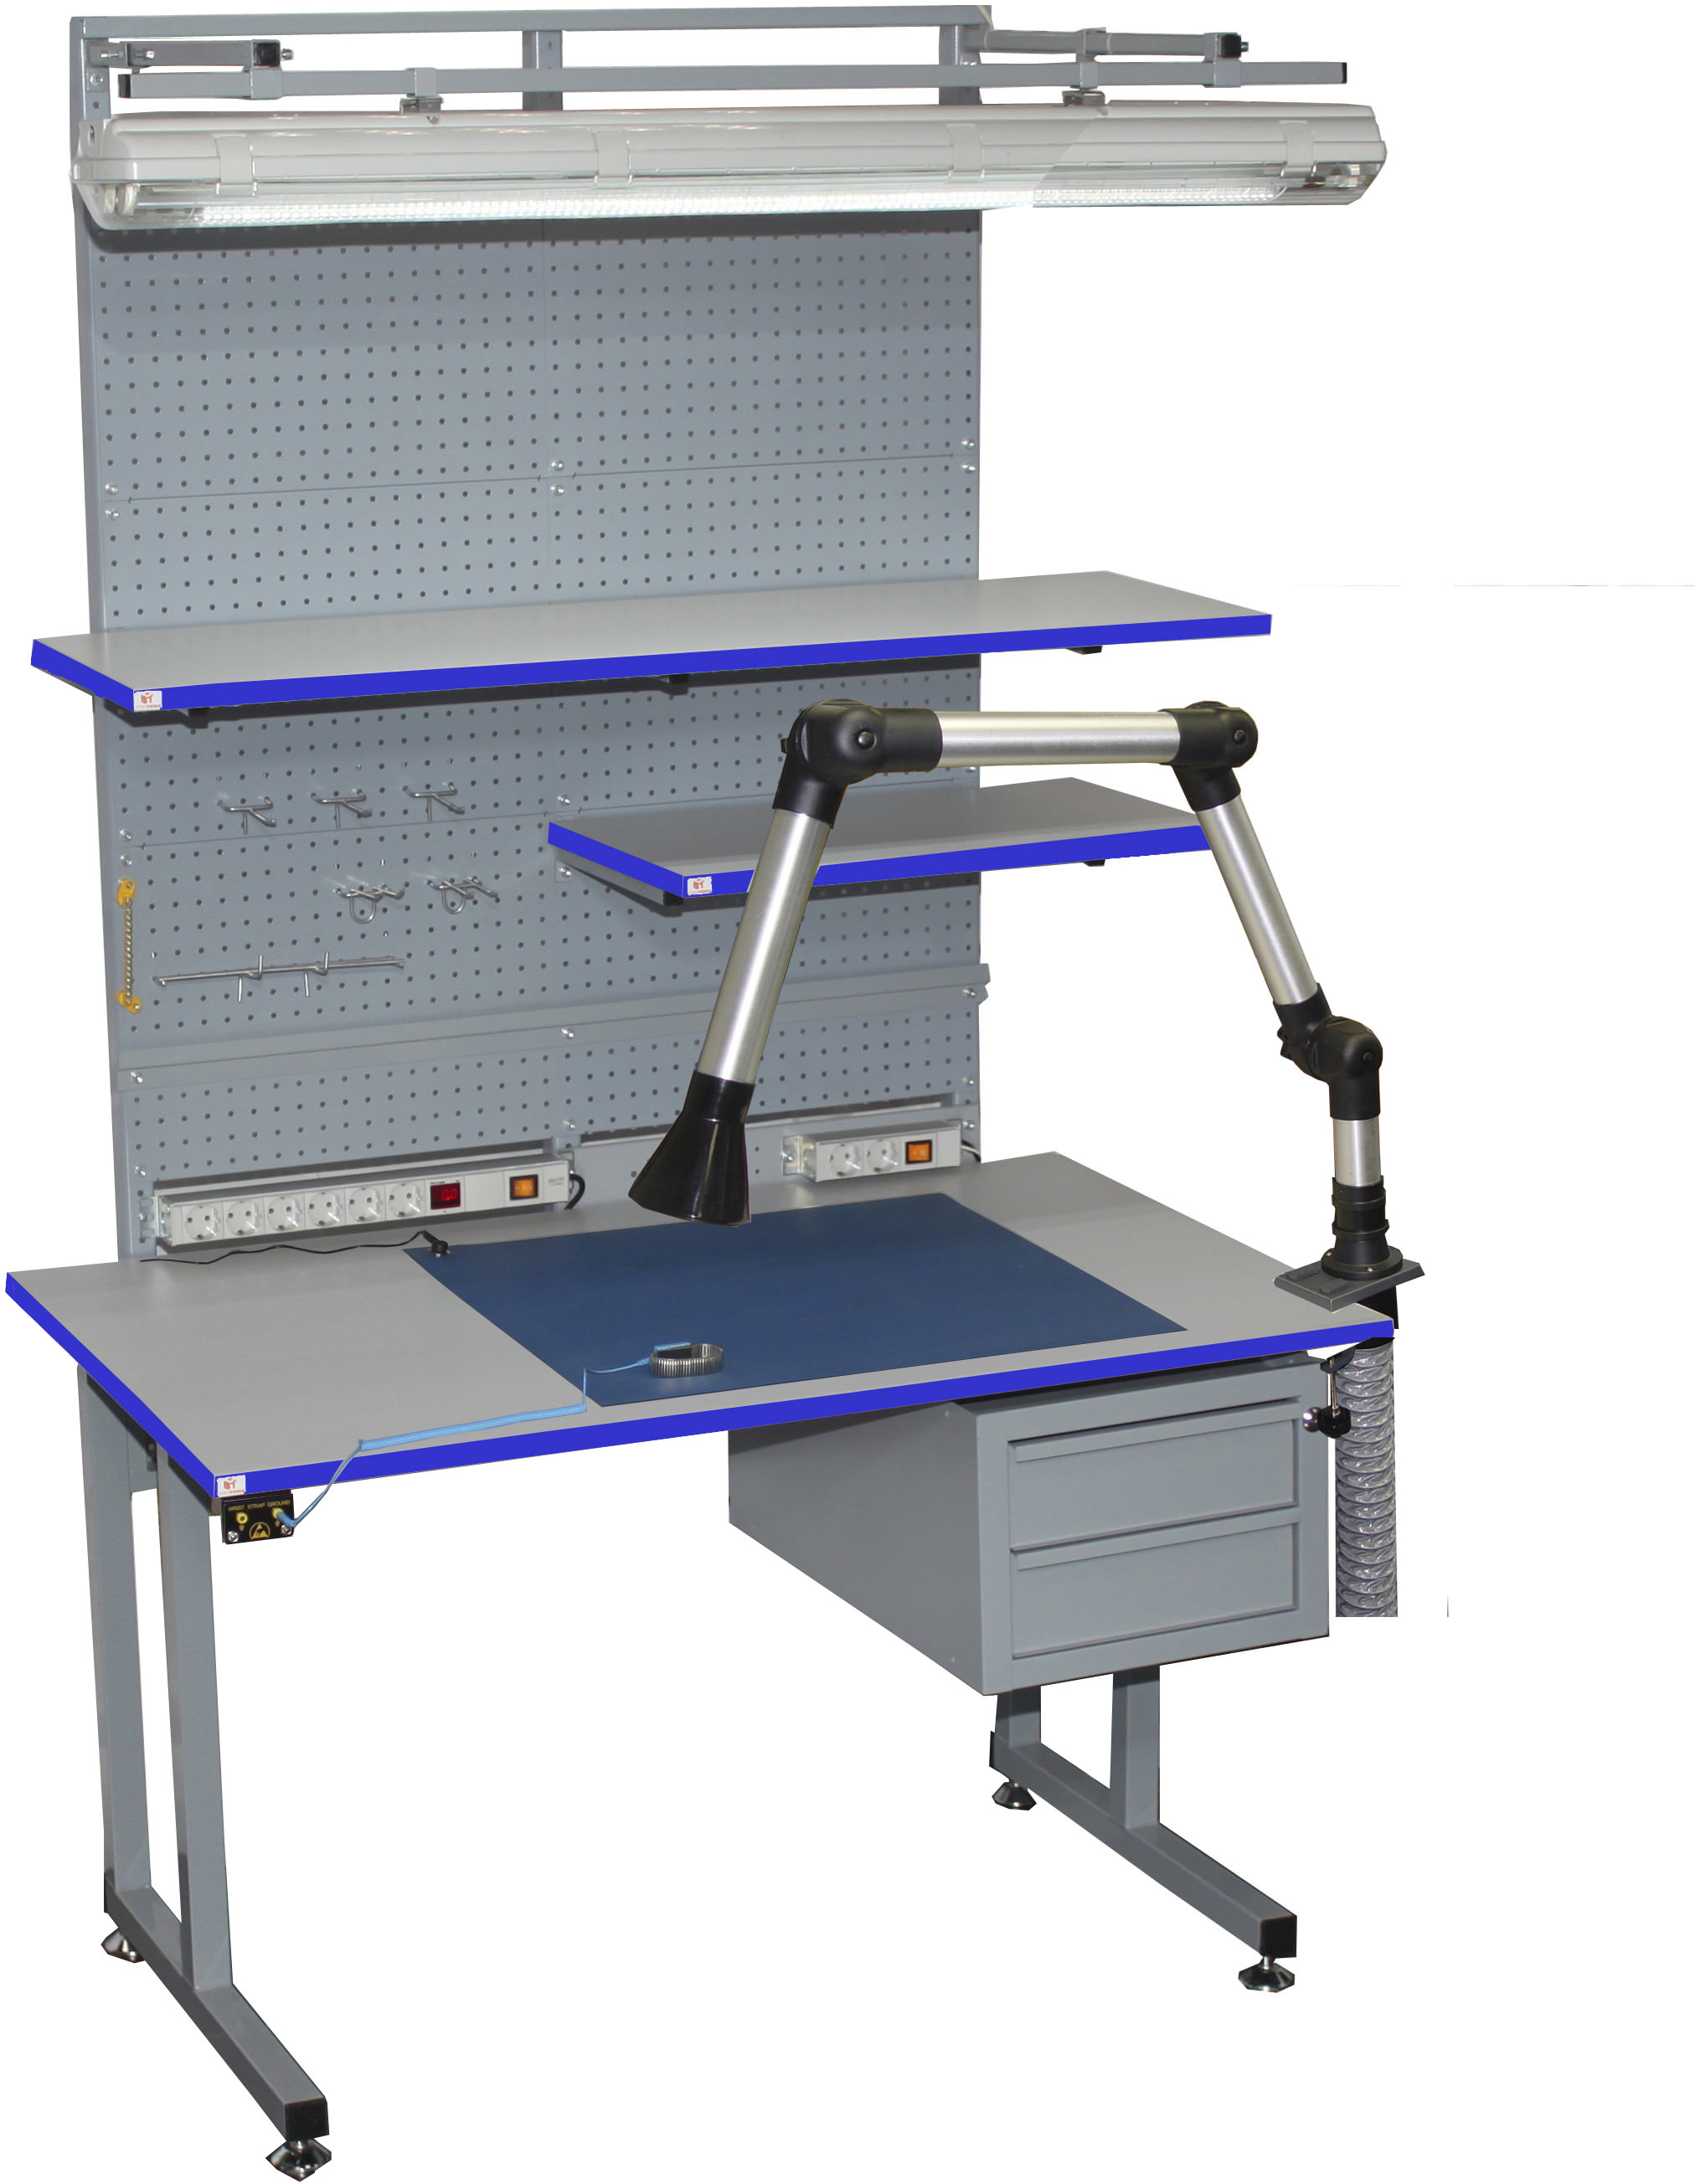 Стол С5-1800x750 ESD, фото 2